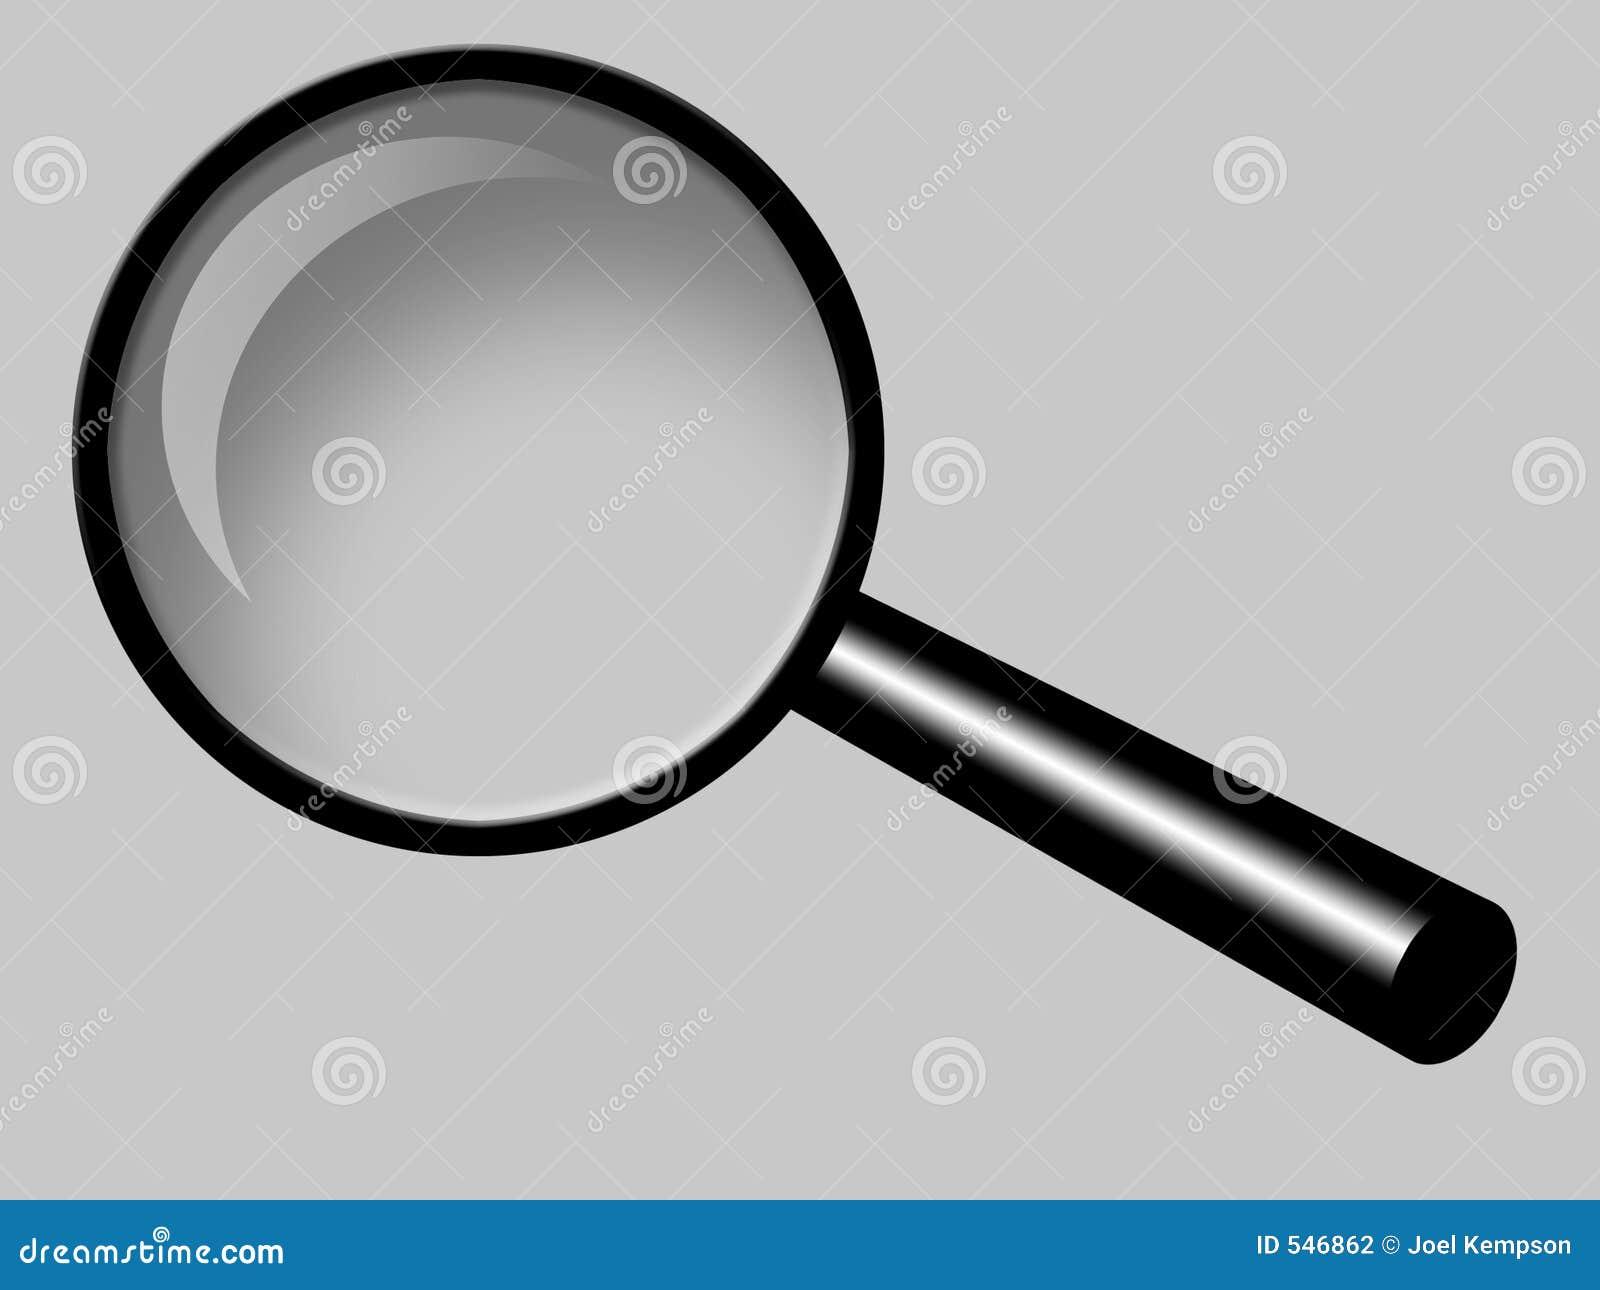 Download 玻璃扩大化 库存例证. 插画 包括有 数字式, 增量, 提高, 好奇, 眼睛, 设计, 特写镜头, 重点, 扩大 - 546862